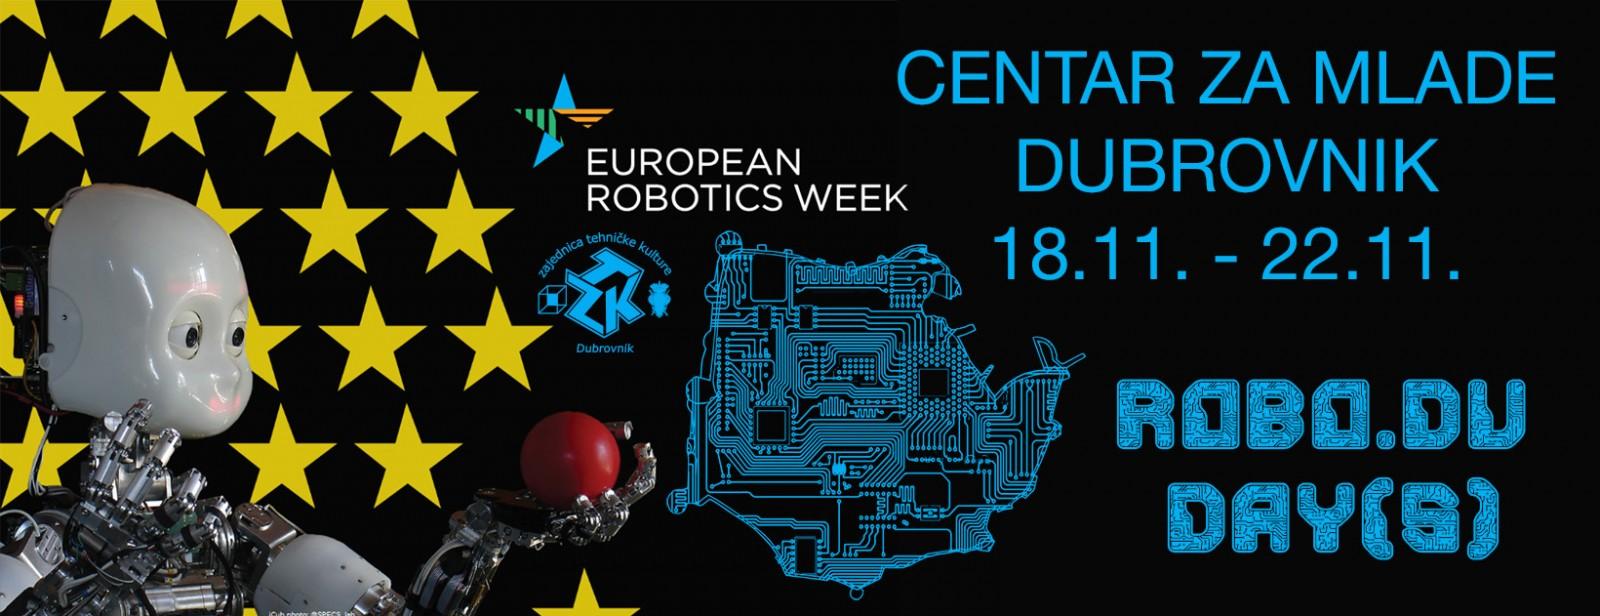 Počinje petodnevno obilježavanje Europskog tjedna robotike u Centru za mlade Dubrovnik